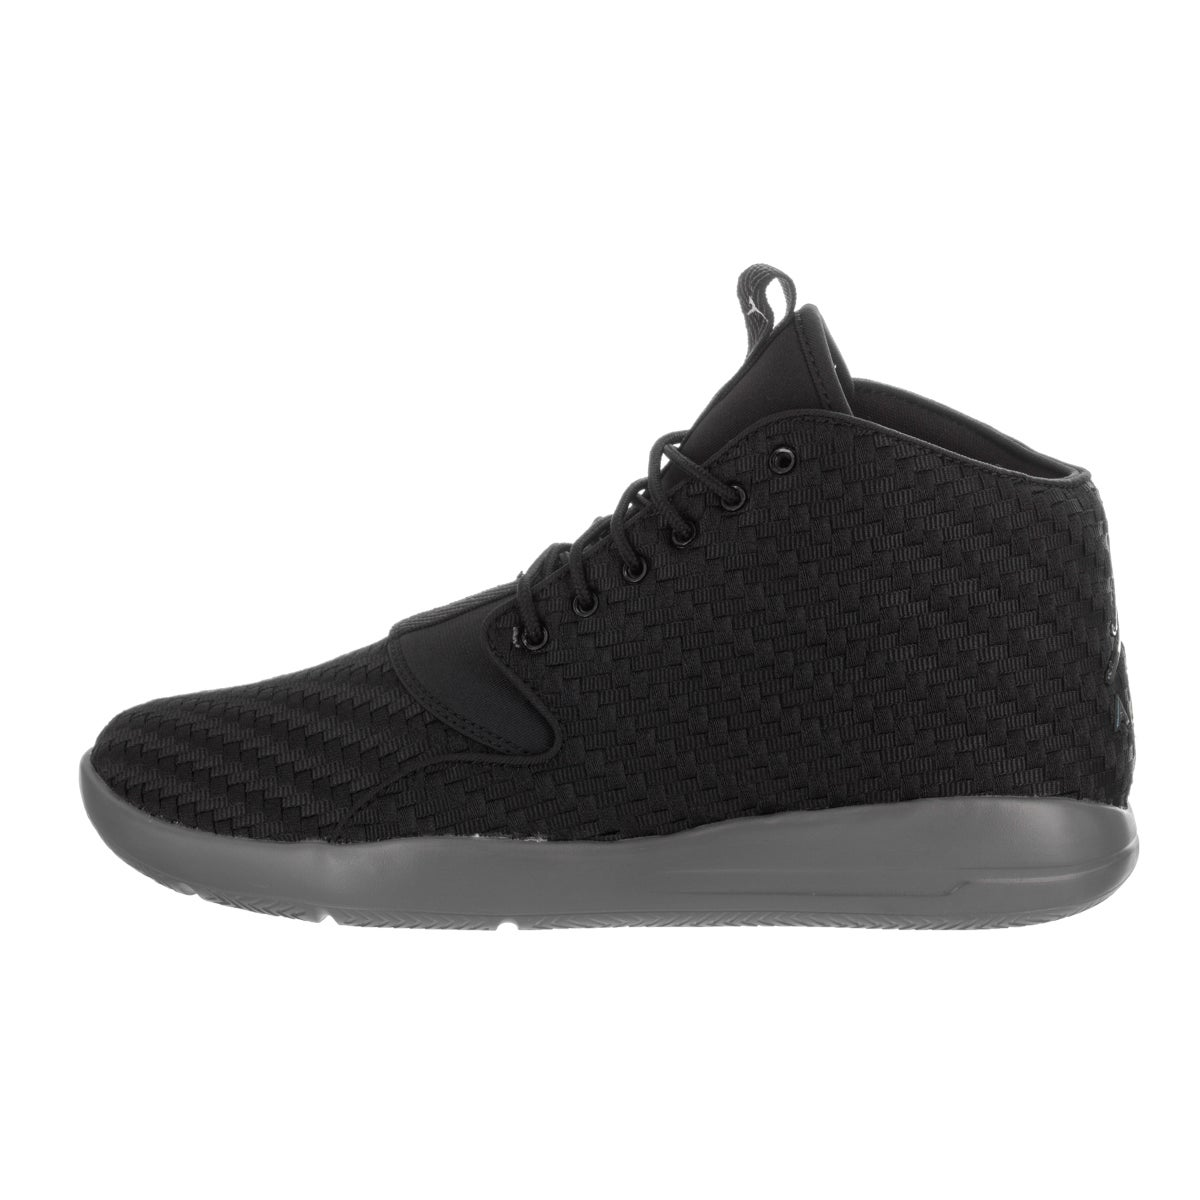 finest selection f7696 c4be6 Shop Nike Jordan Men s Jordan Eclipse Chukka Black Basketball Shoes - Free  Shipping Today - Overstock - 14595260